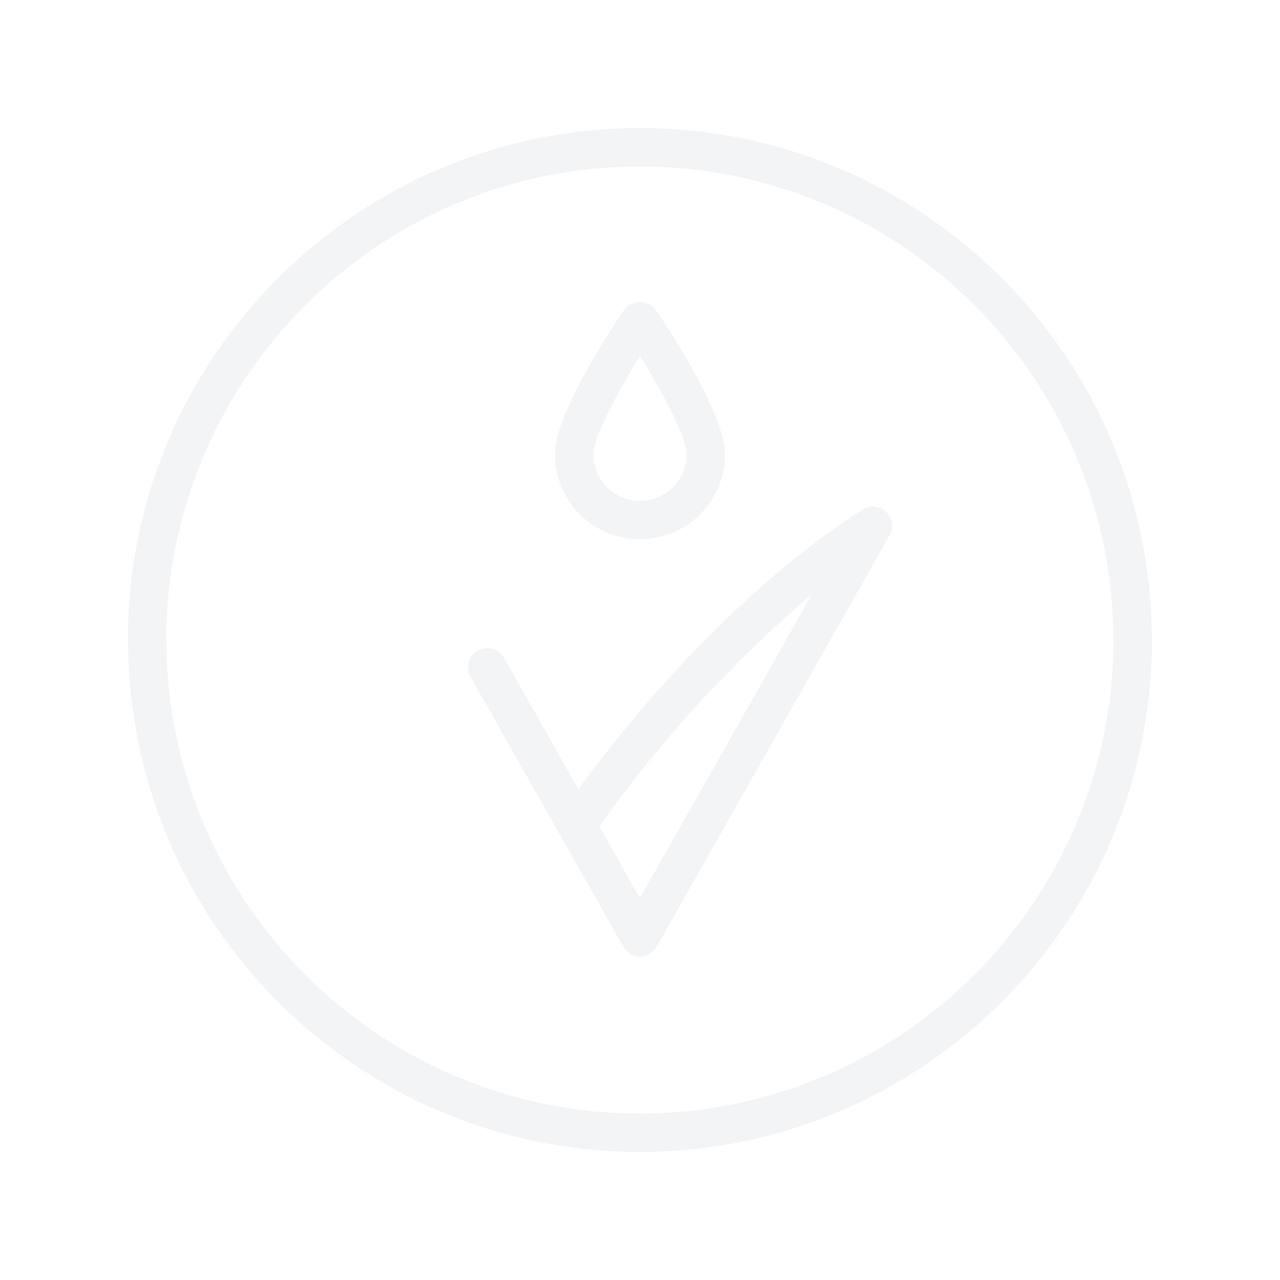 NANSHY Small Clear Cosmetic Bag